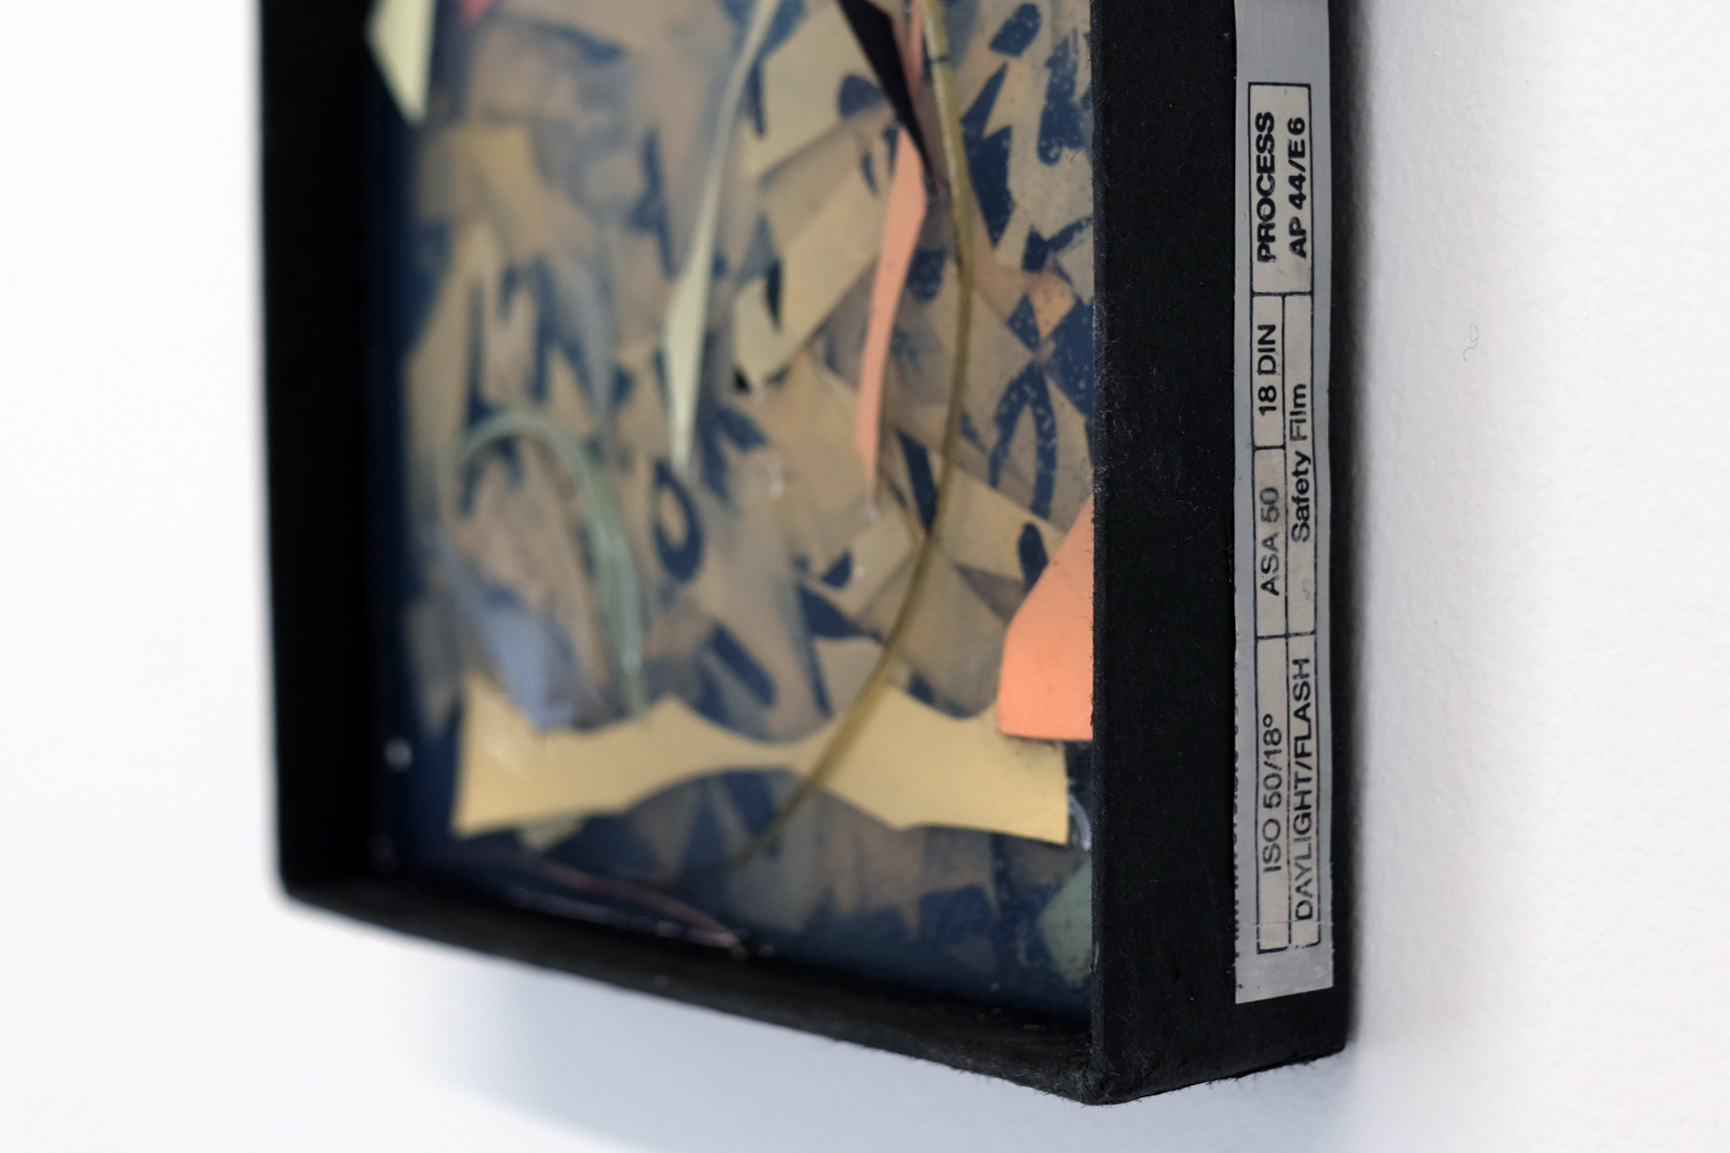 Charlie Godet Thomas, Fix, 2021. Cast rubber, box for photographic paper, card and paper fragments, paint. 14.5 x 12 x 5 cm. Unique.